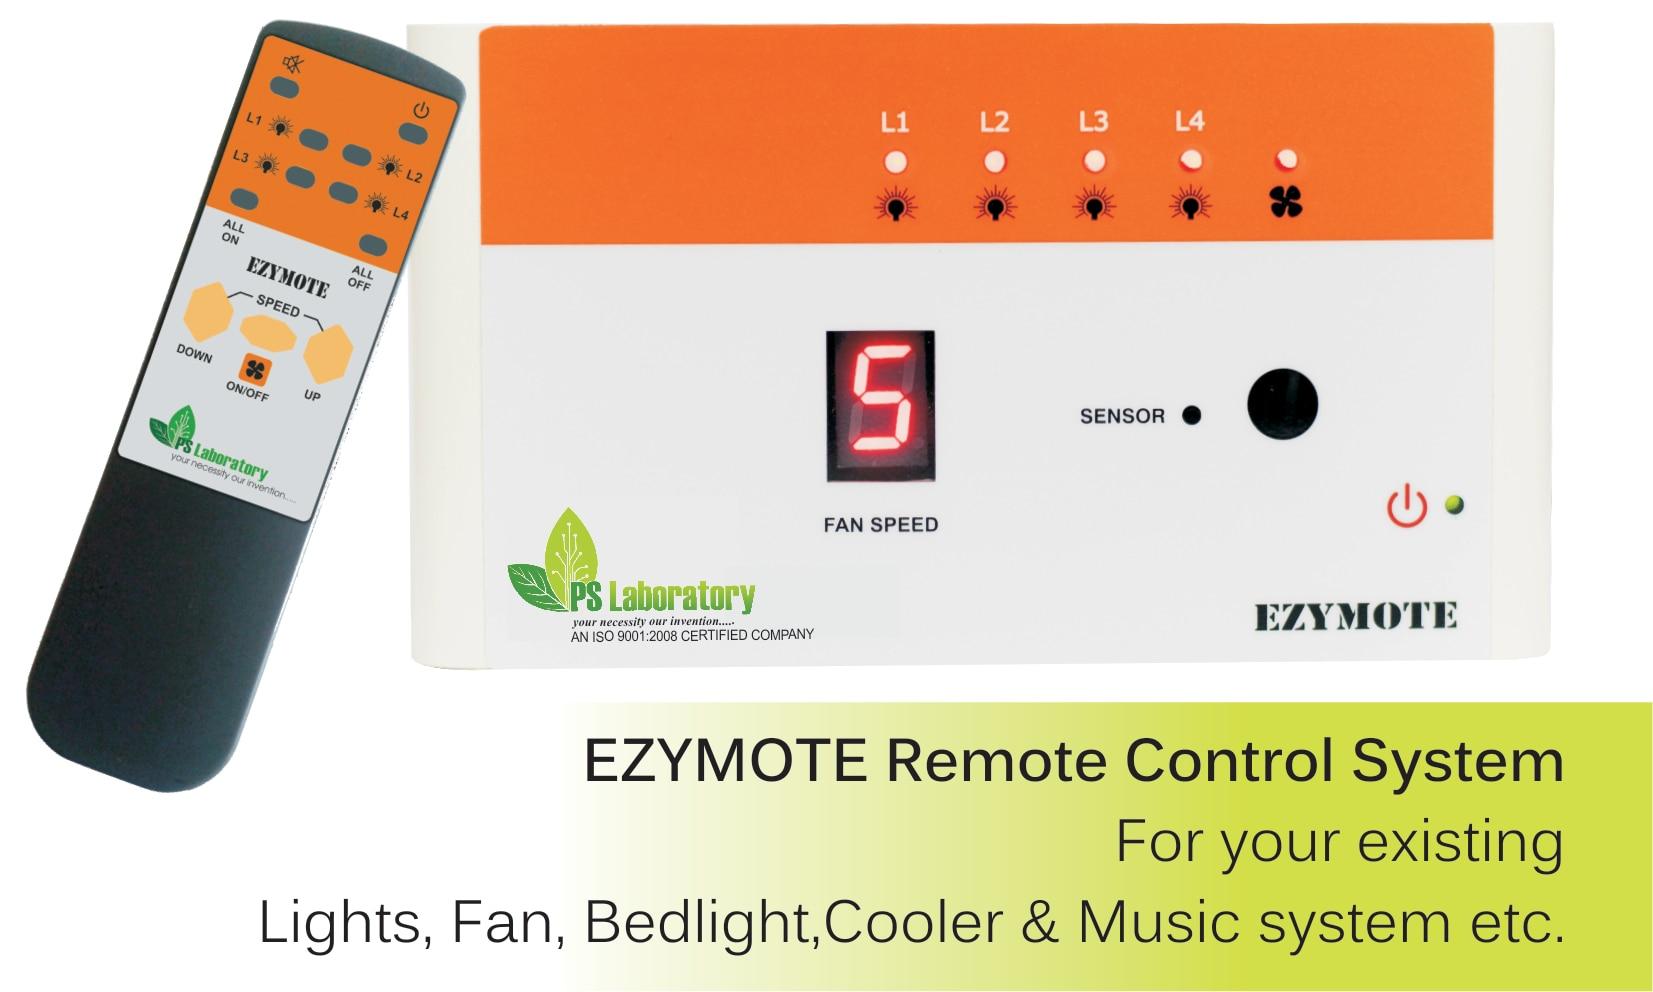 EZYMOTE Remote Control System